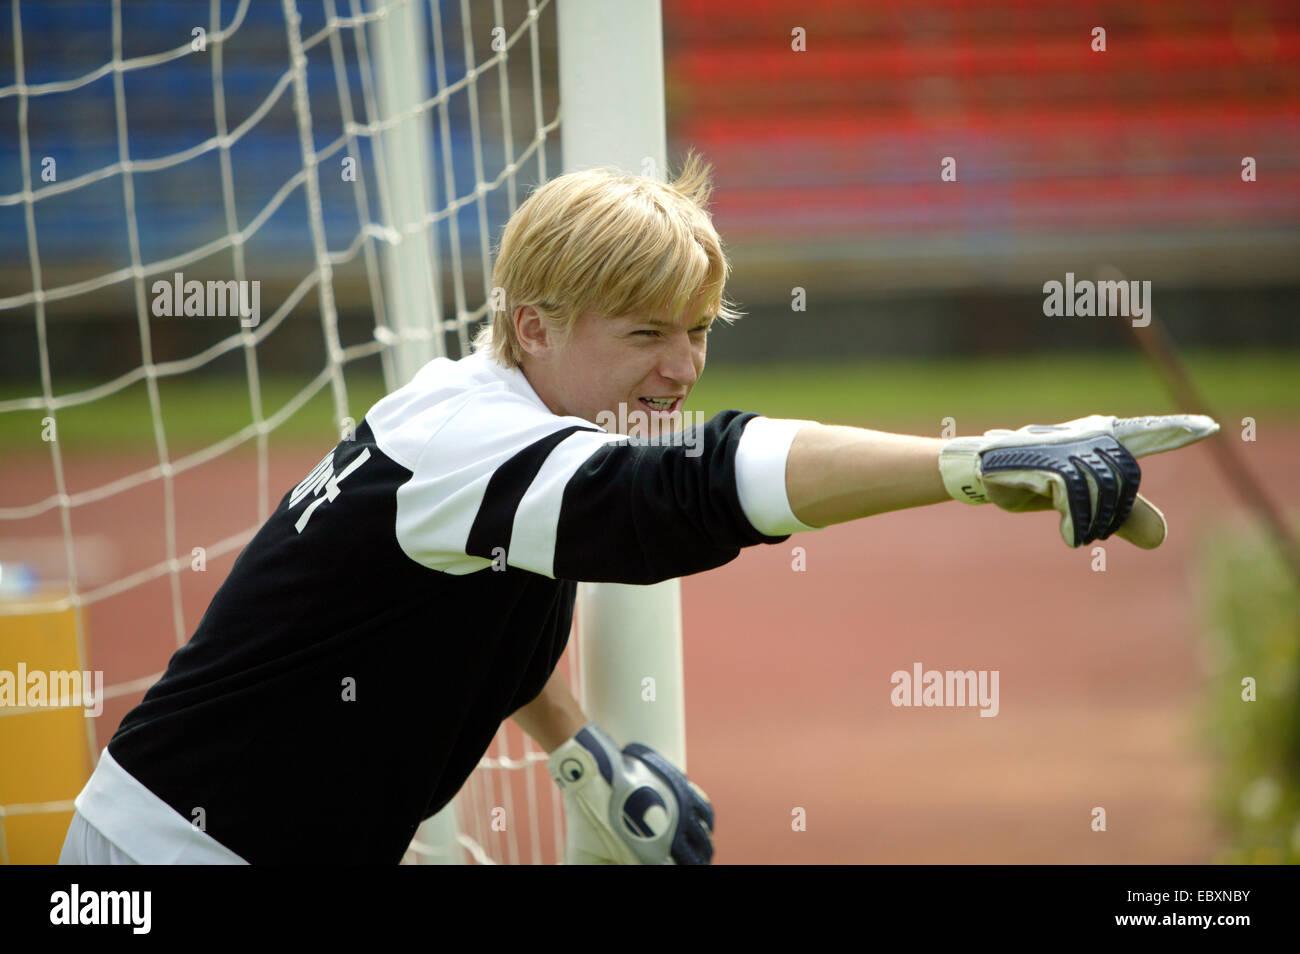 football player, goalkeeper - Stock Image